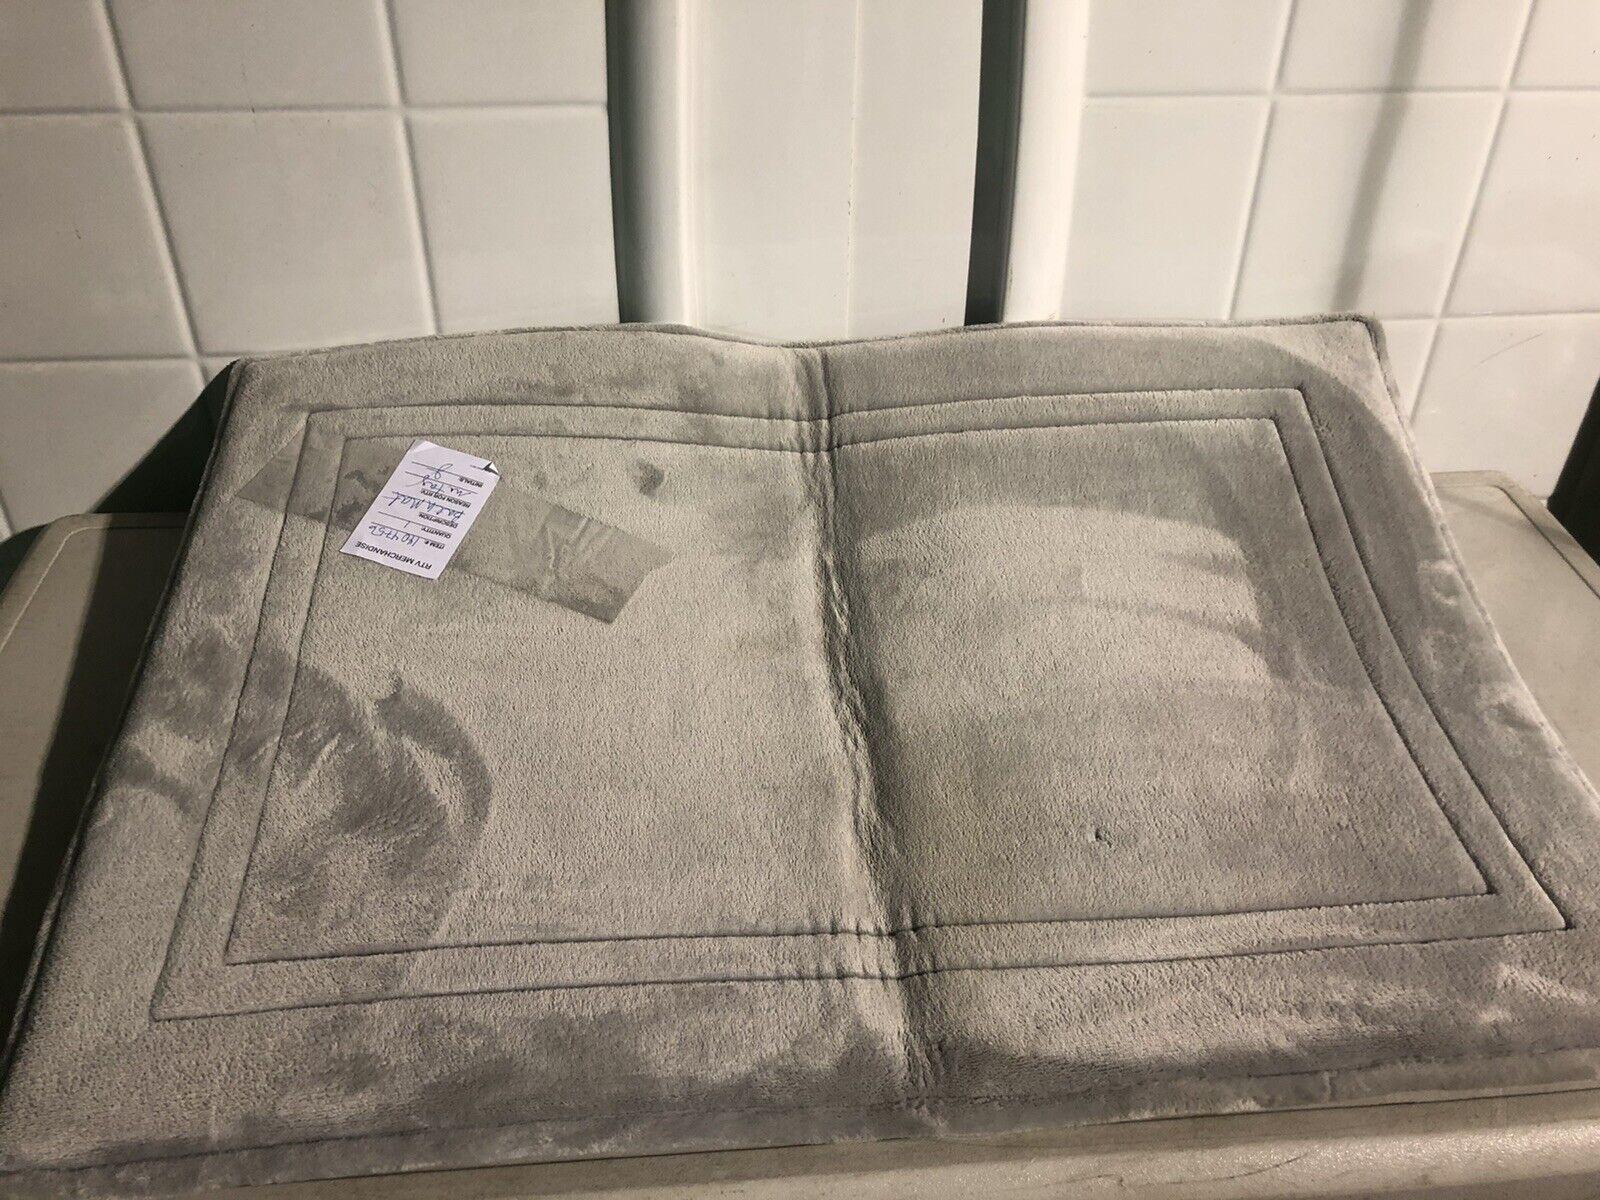 Paramount 24 By 36 Light Green Memory Foam Bath Mat Rug Buy It Now For Sale Online Ebay